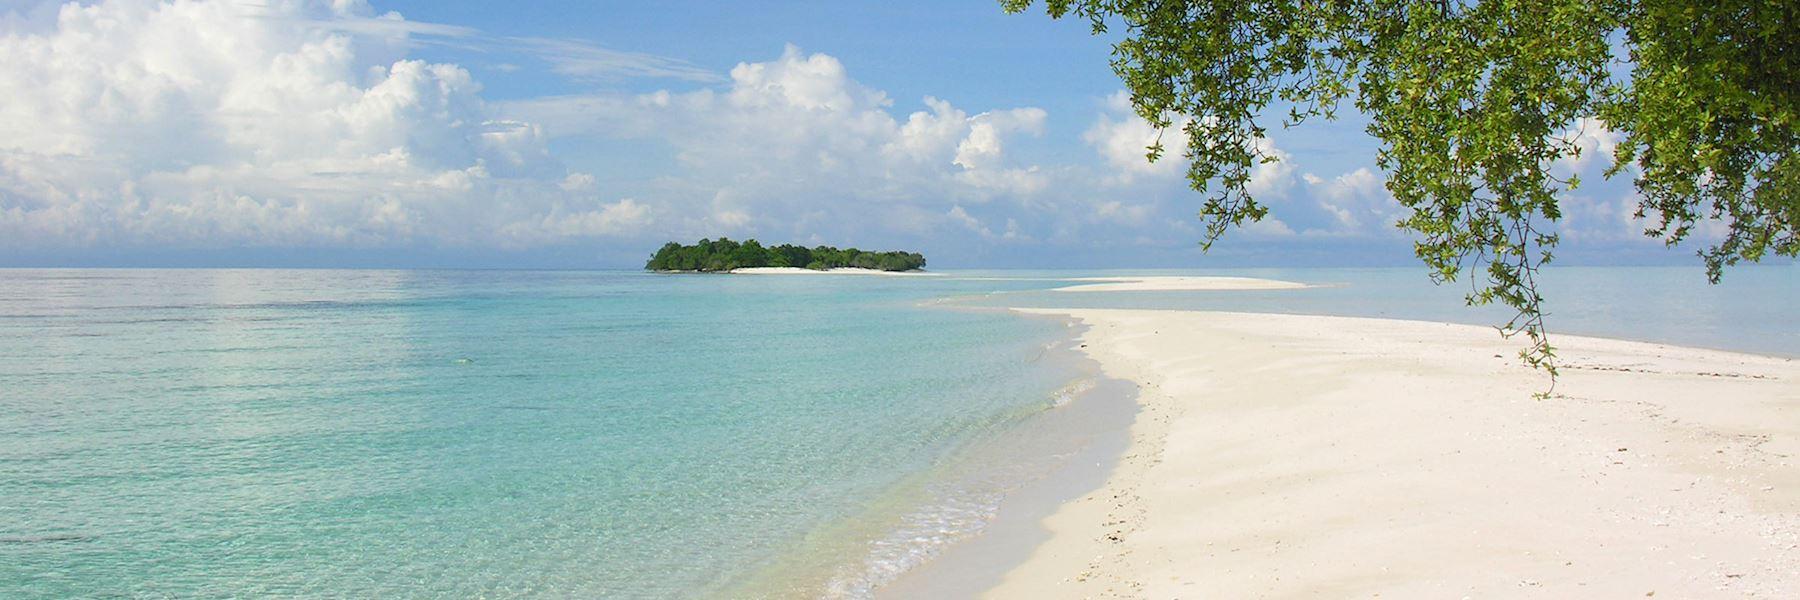 Visit Mataking Island, Borneo